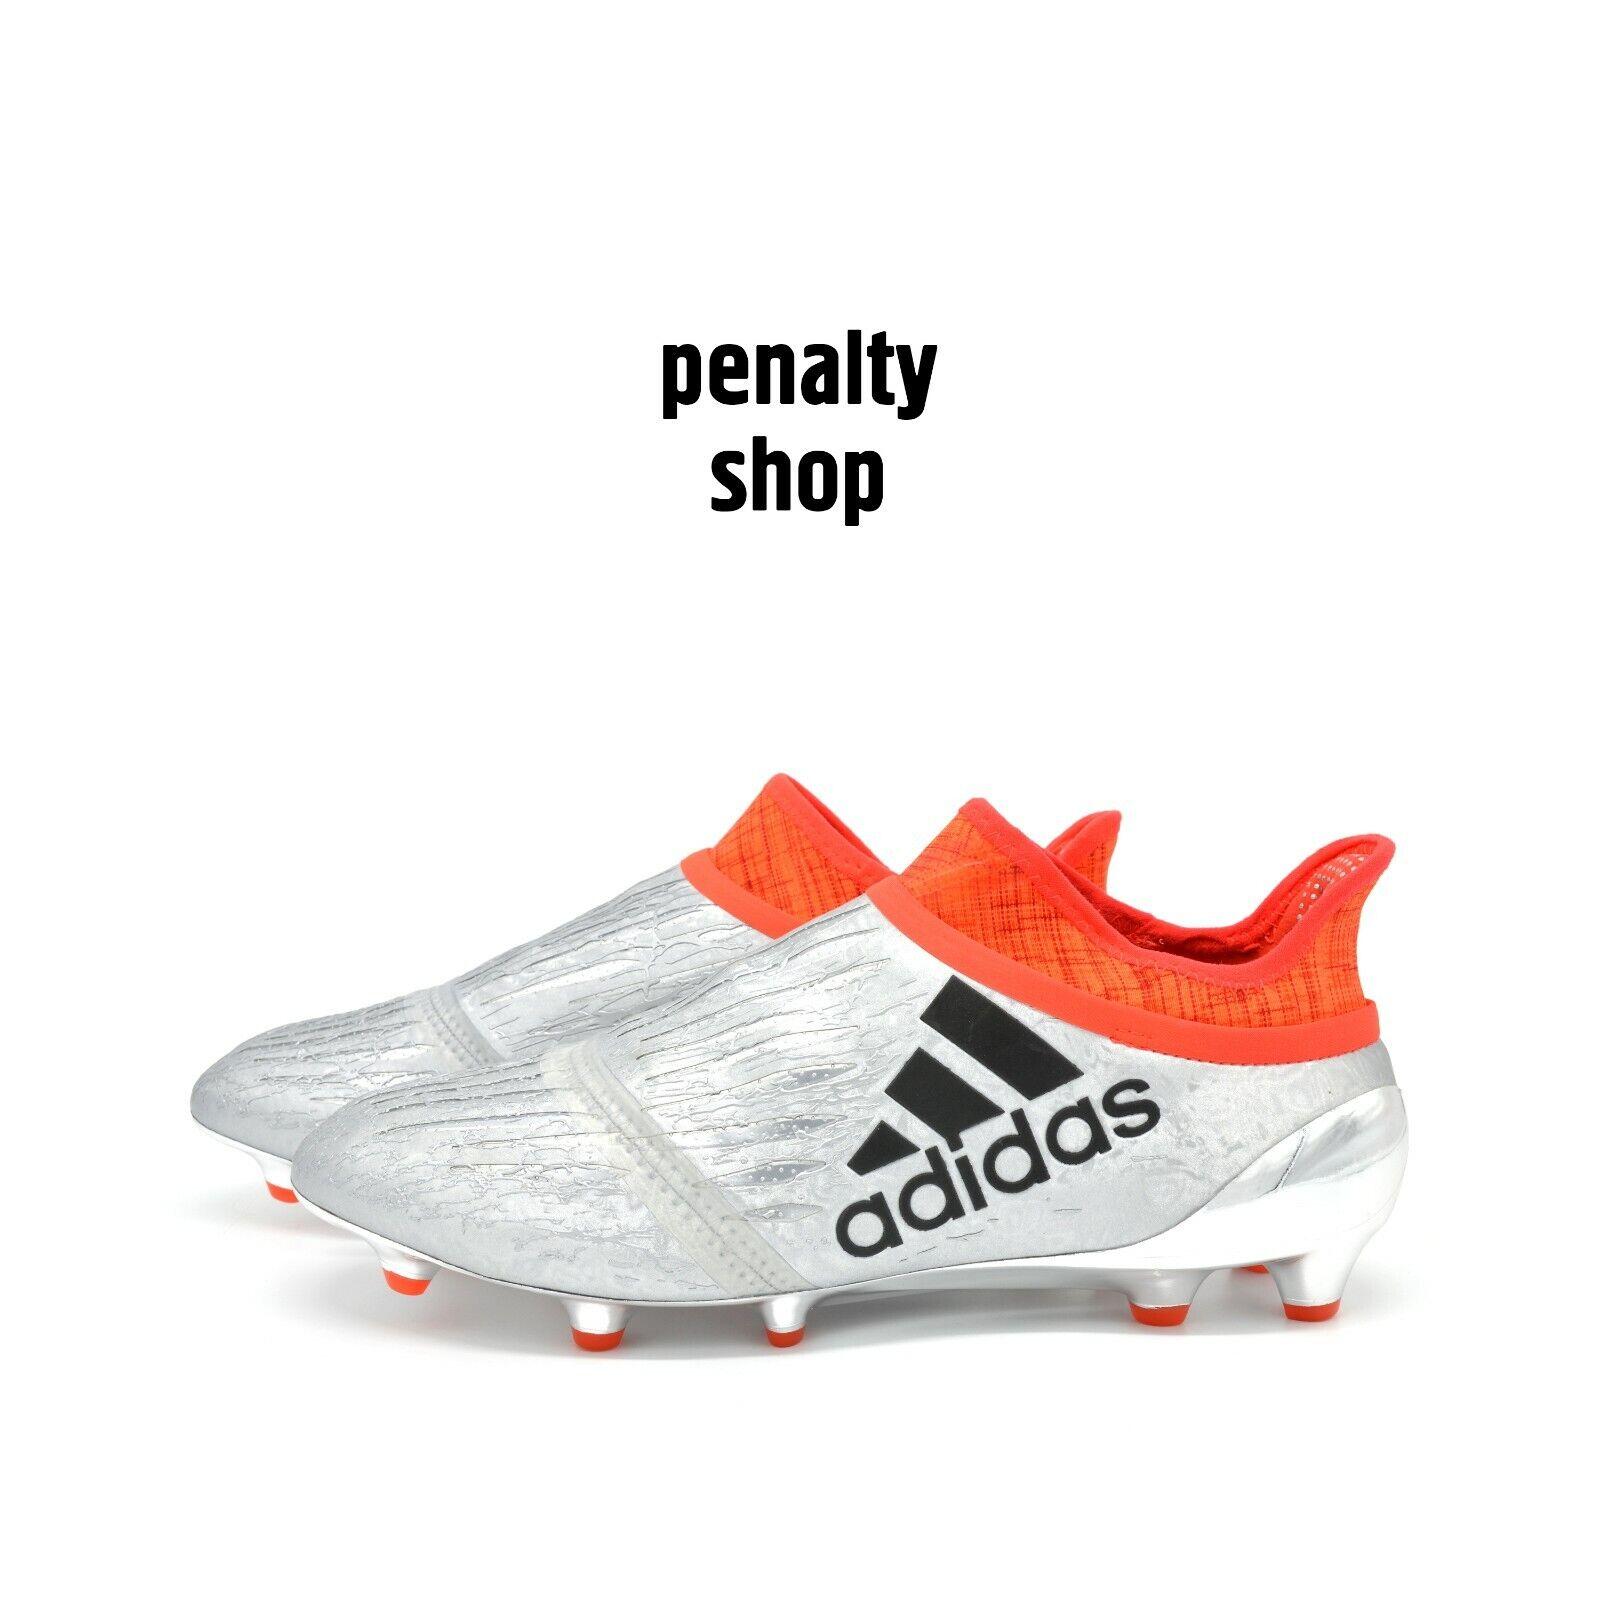 Adidas X 16 Purechaos FG S79511 RARE Limited Edition